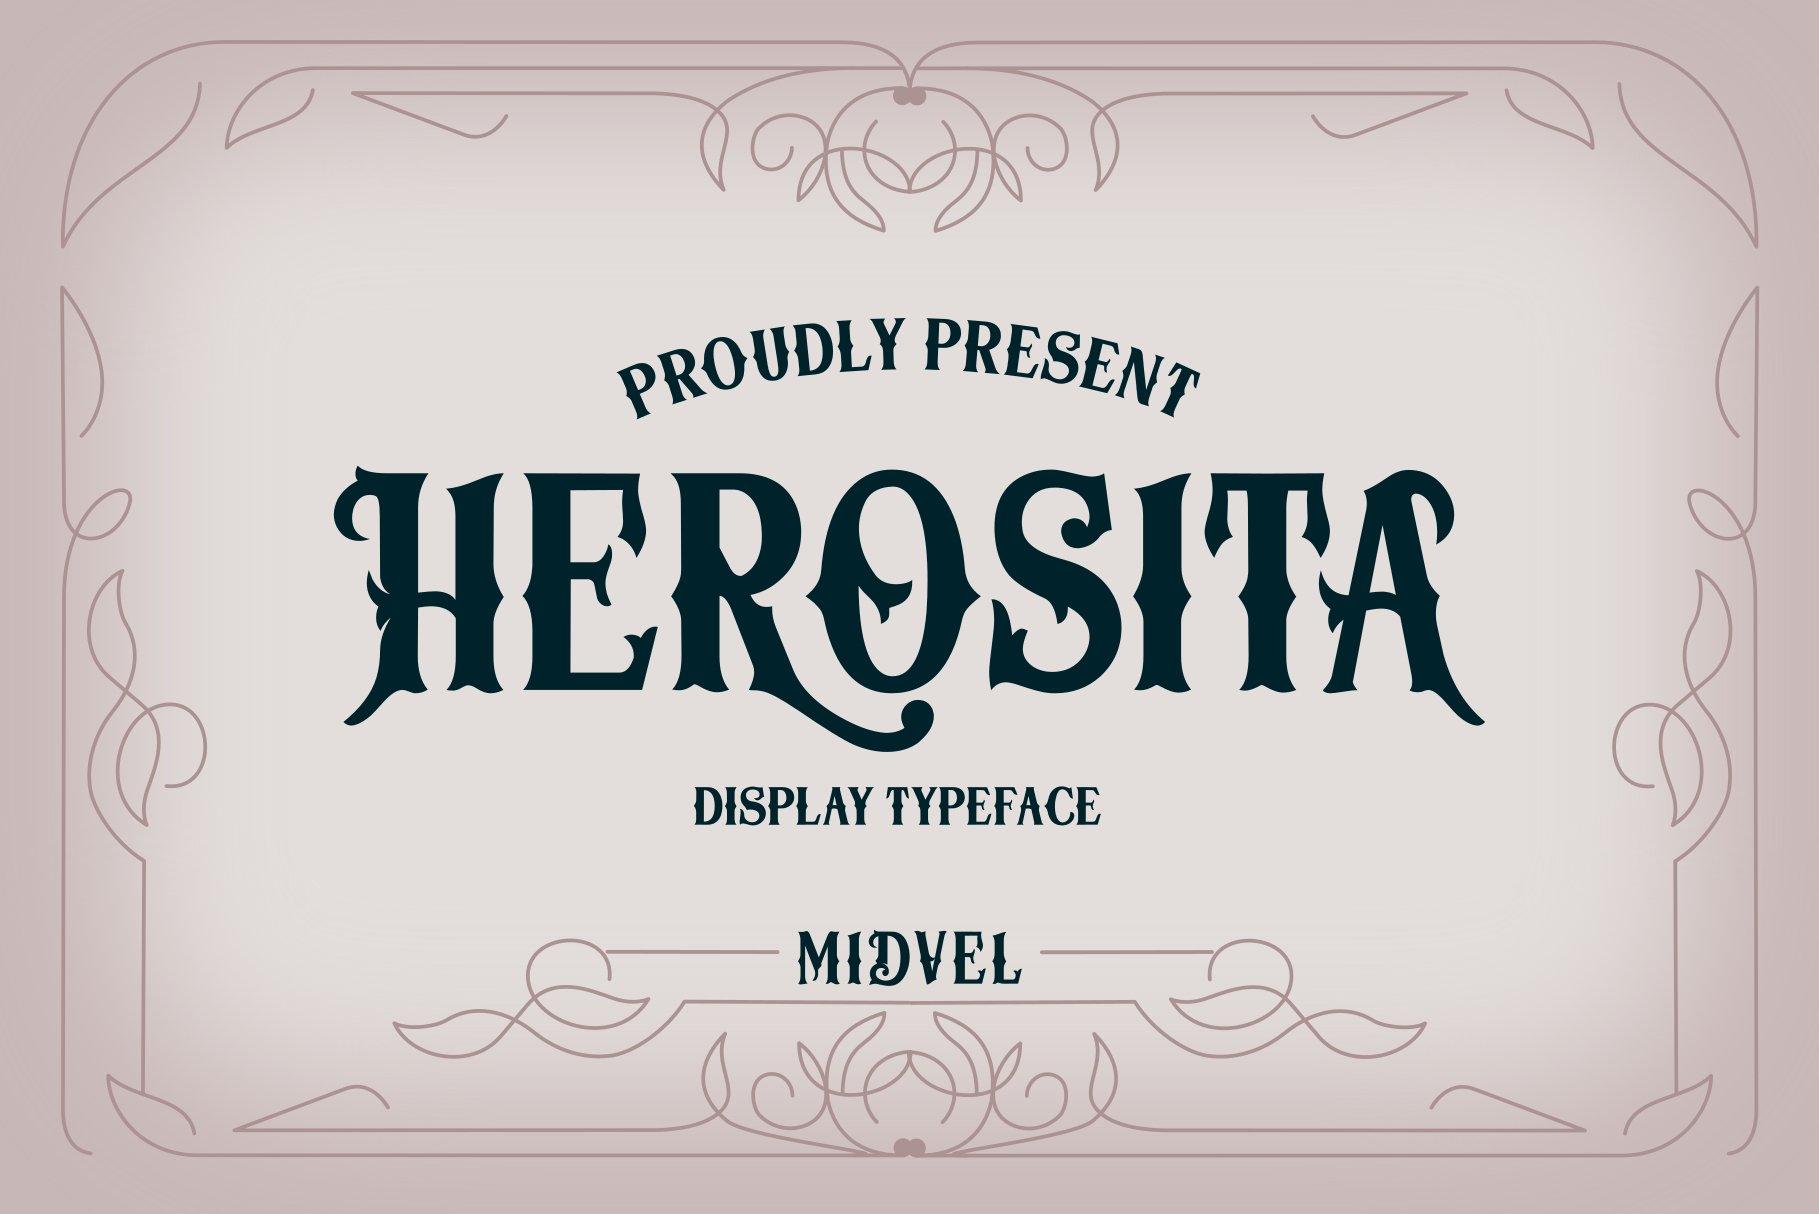 Herosita Typeface example image 1